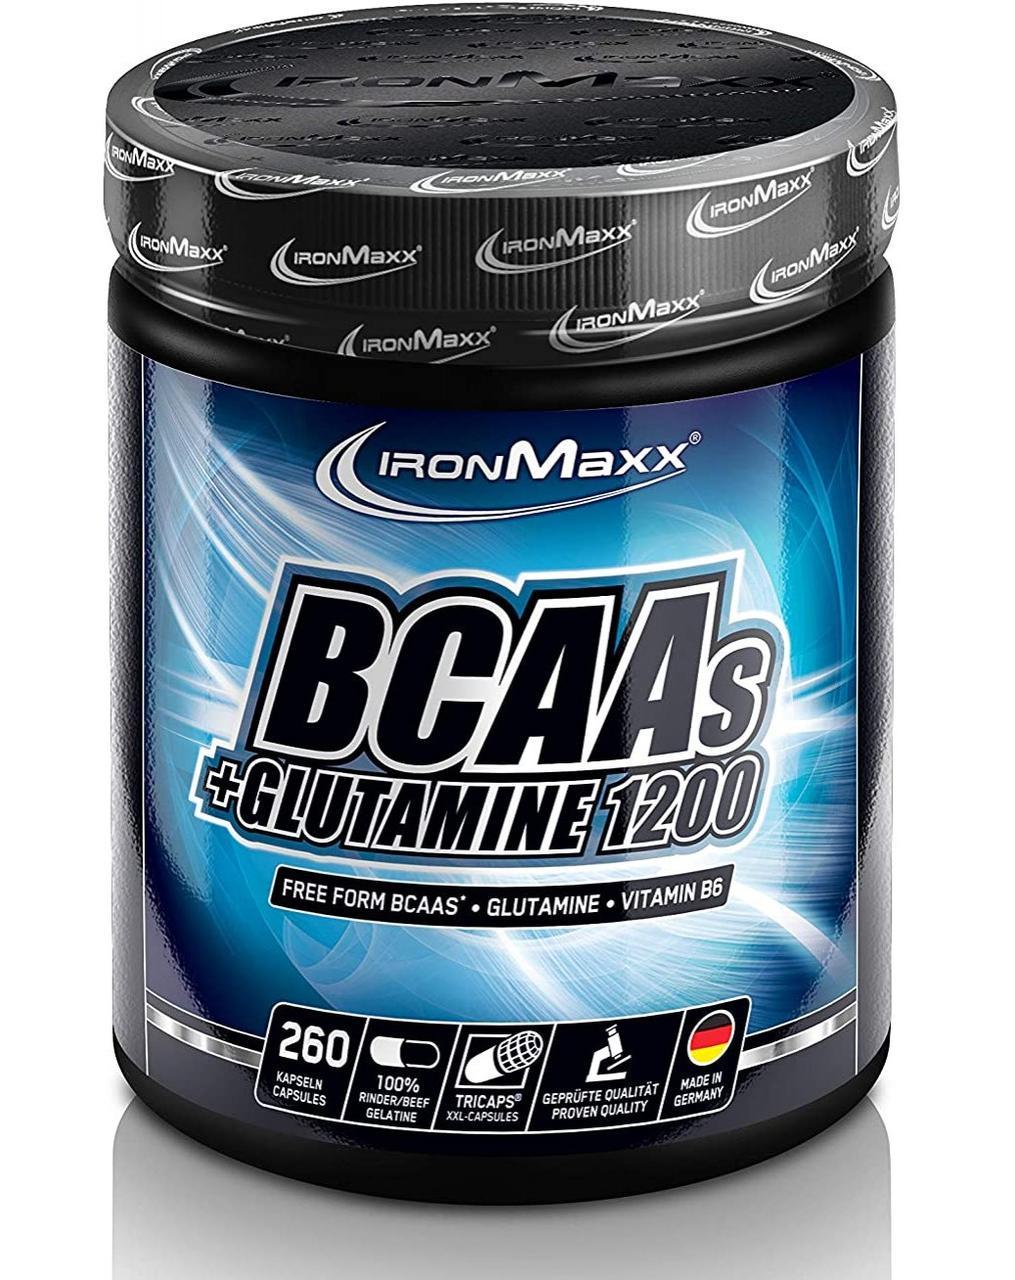 IronMaxx BCAAs + Glutamine 1200 260 caps